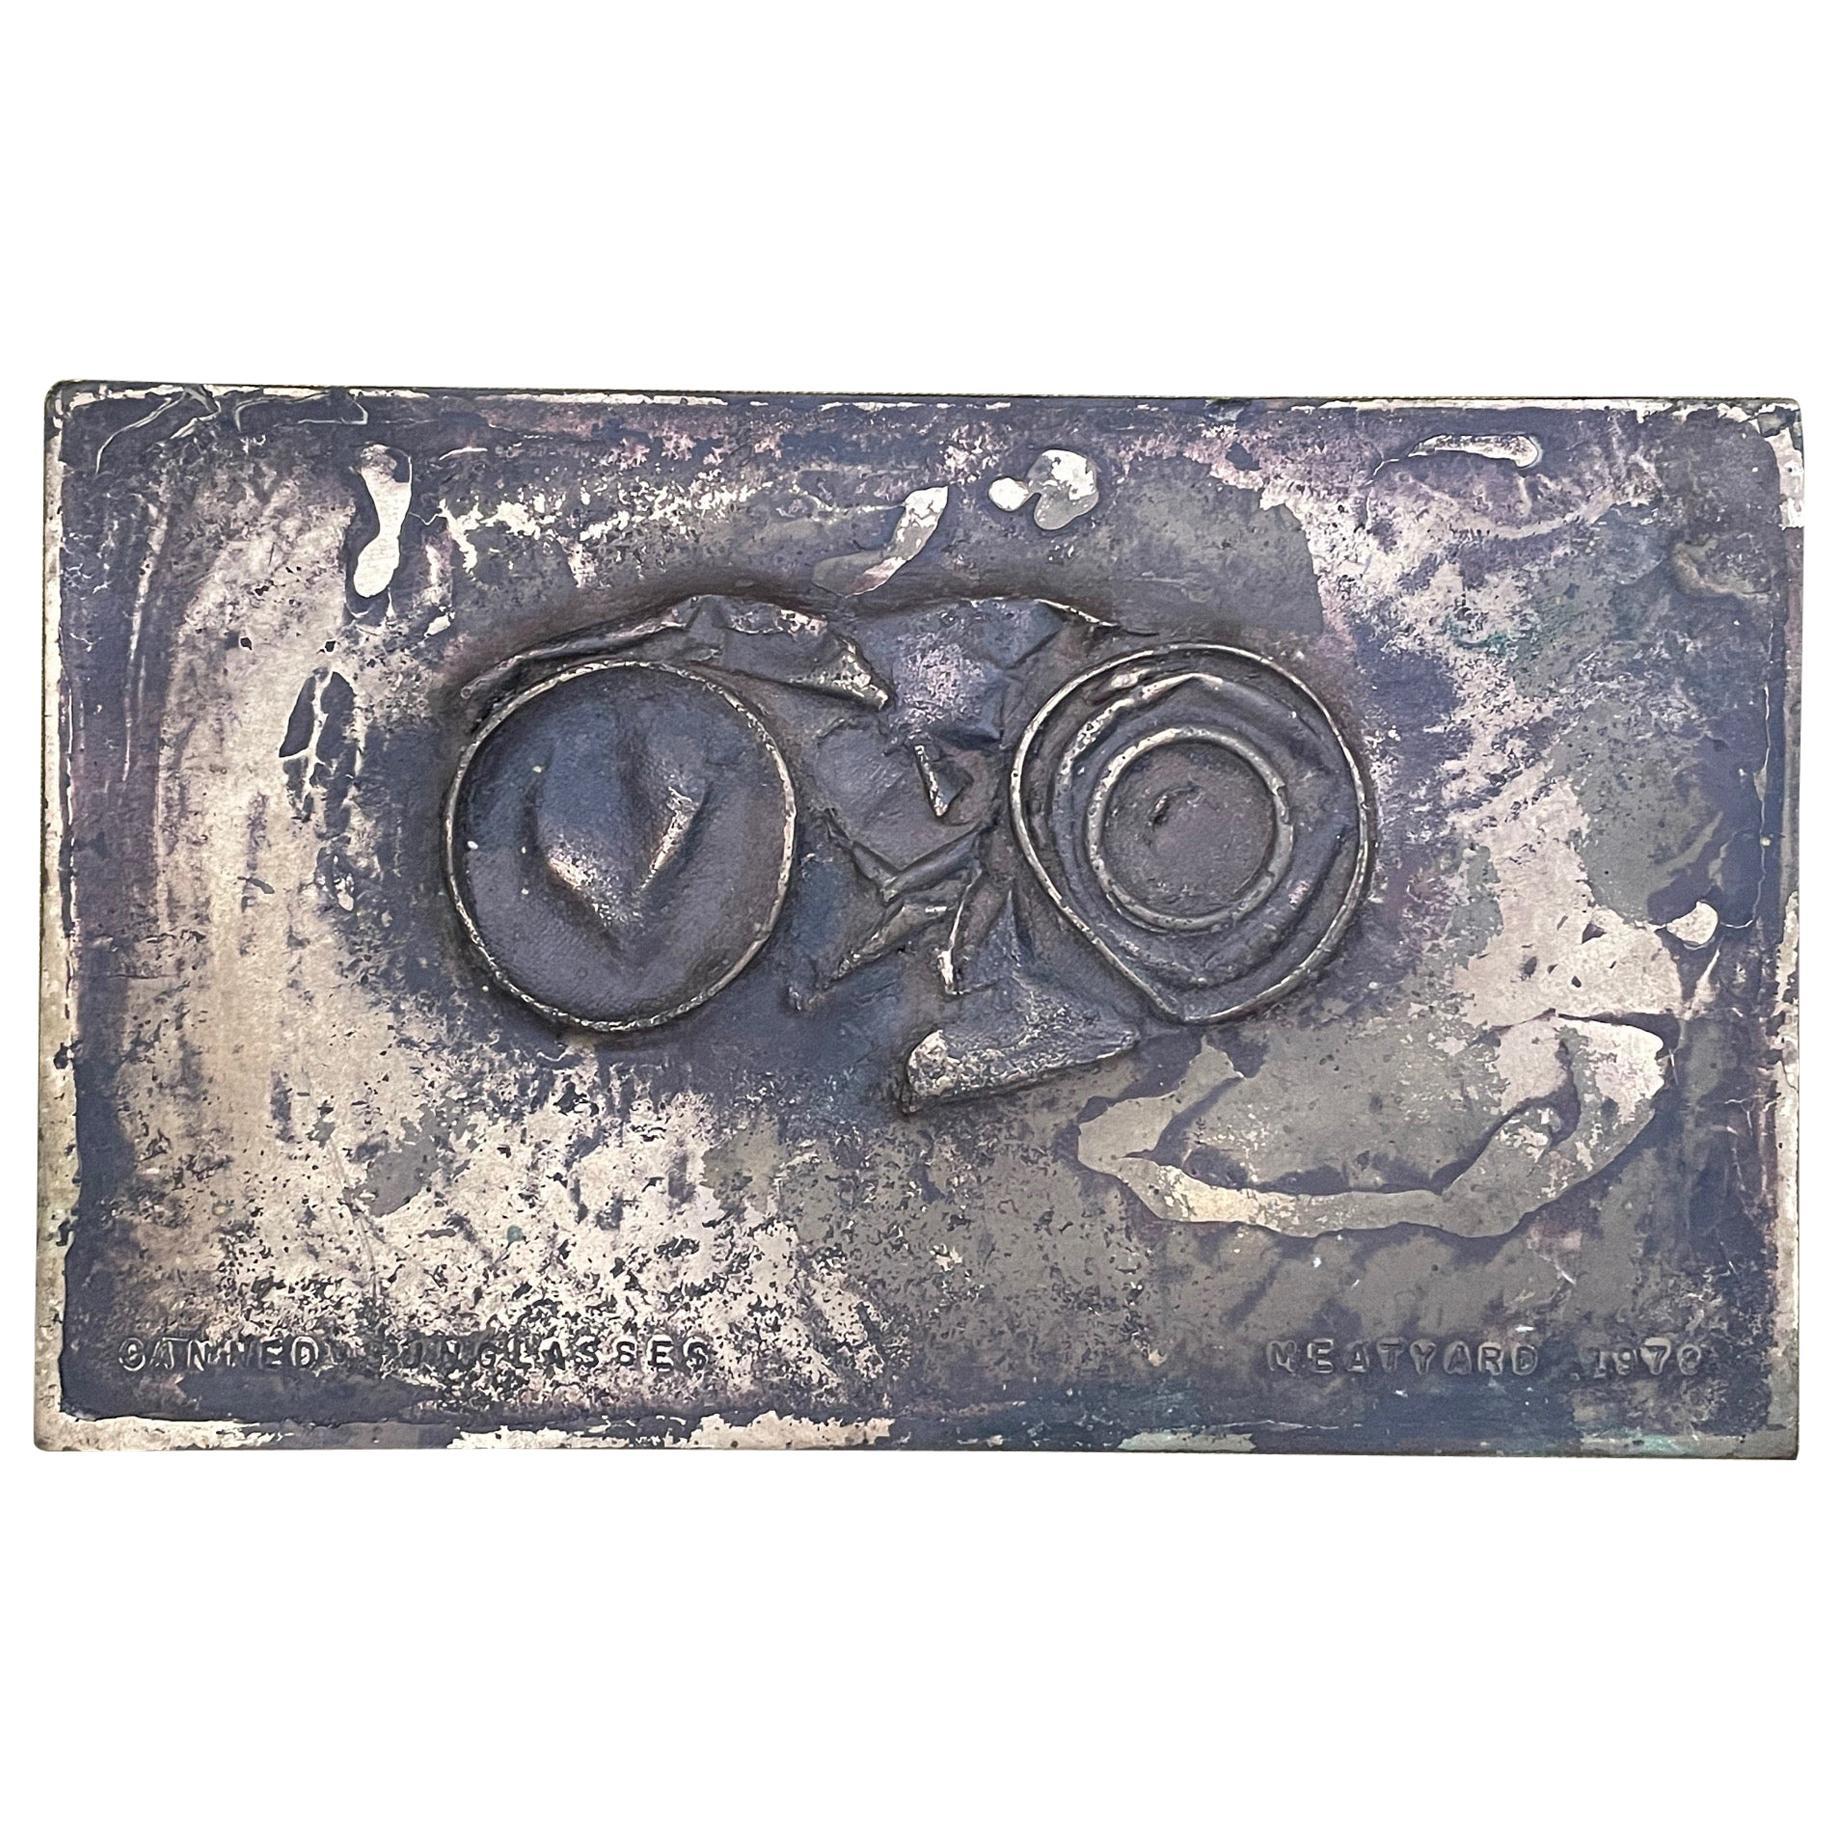 "Bronze Sculpture by Jerry Meatyard ""Sunglasses"", 1978"